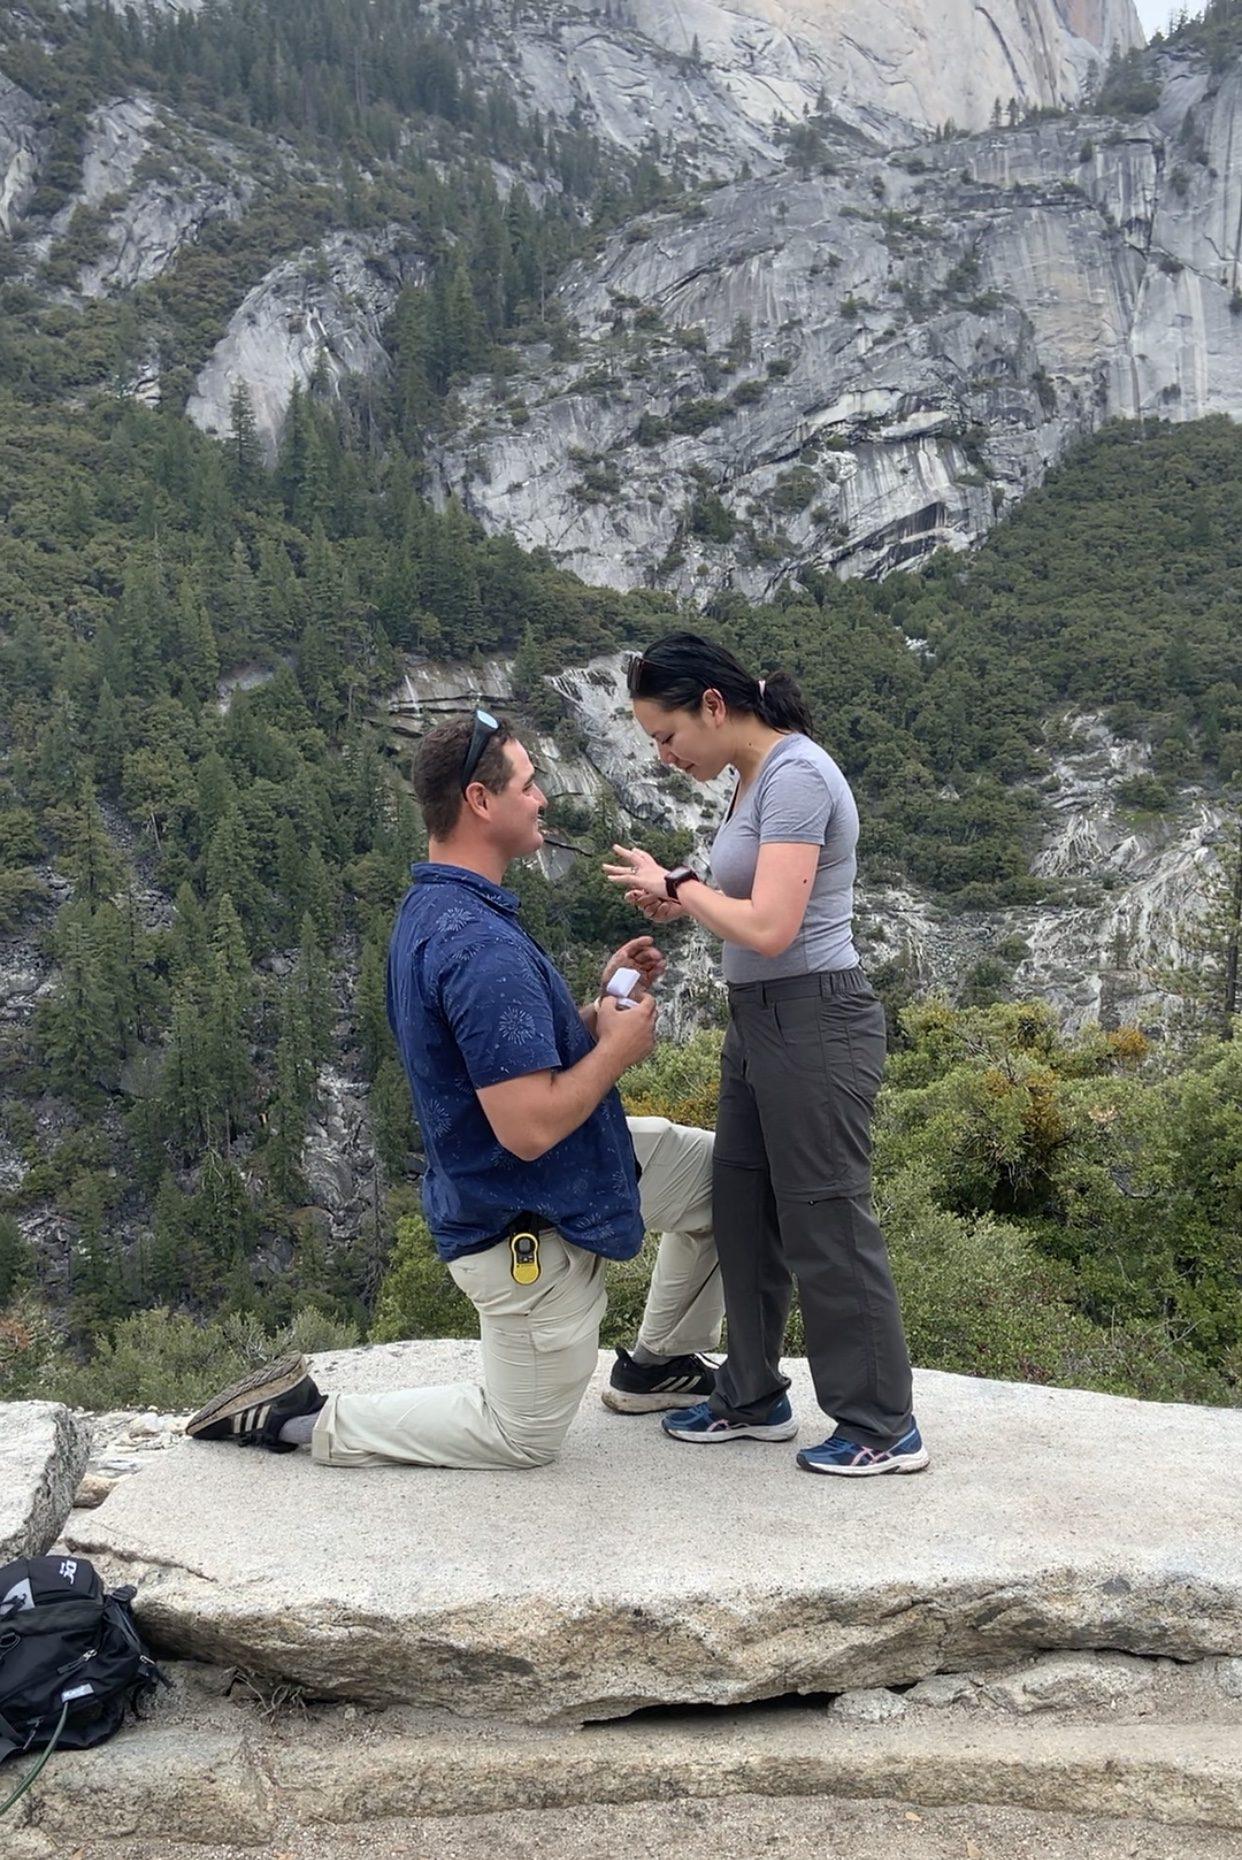 Where to Propose in Yosemite - half dome - John Muir trail